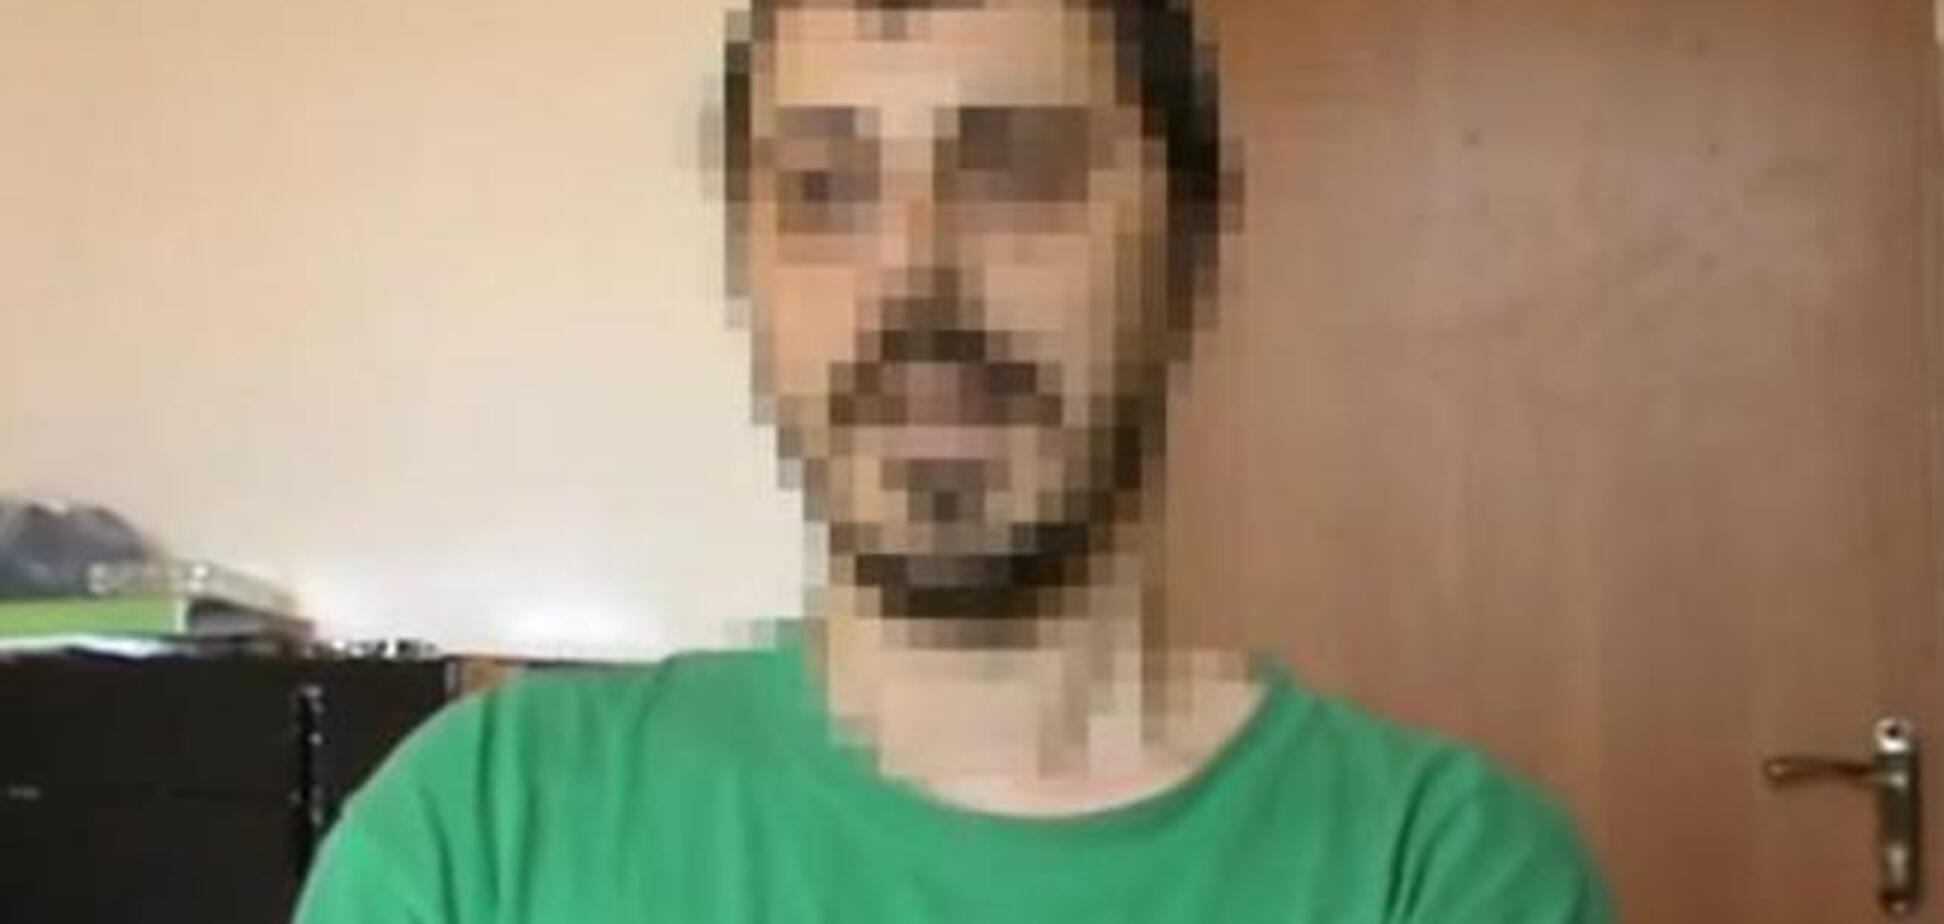 Дело 'николаевского сепаратиста' направлено в суд